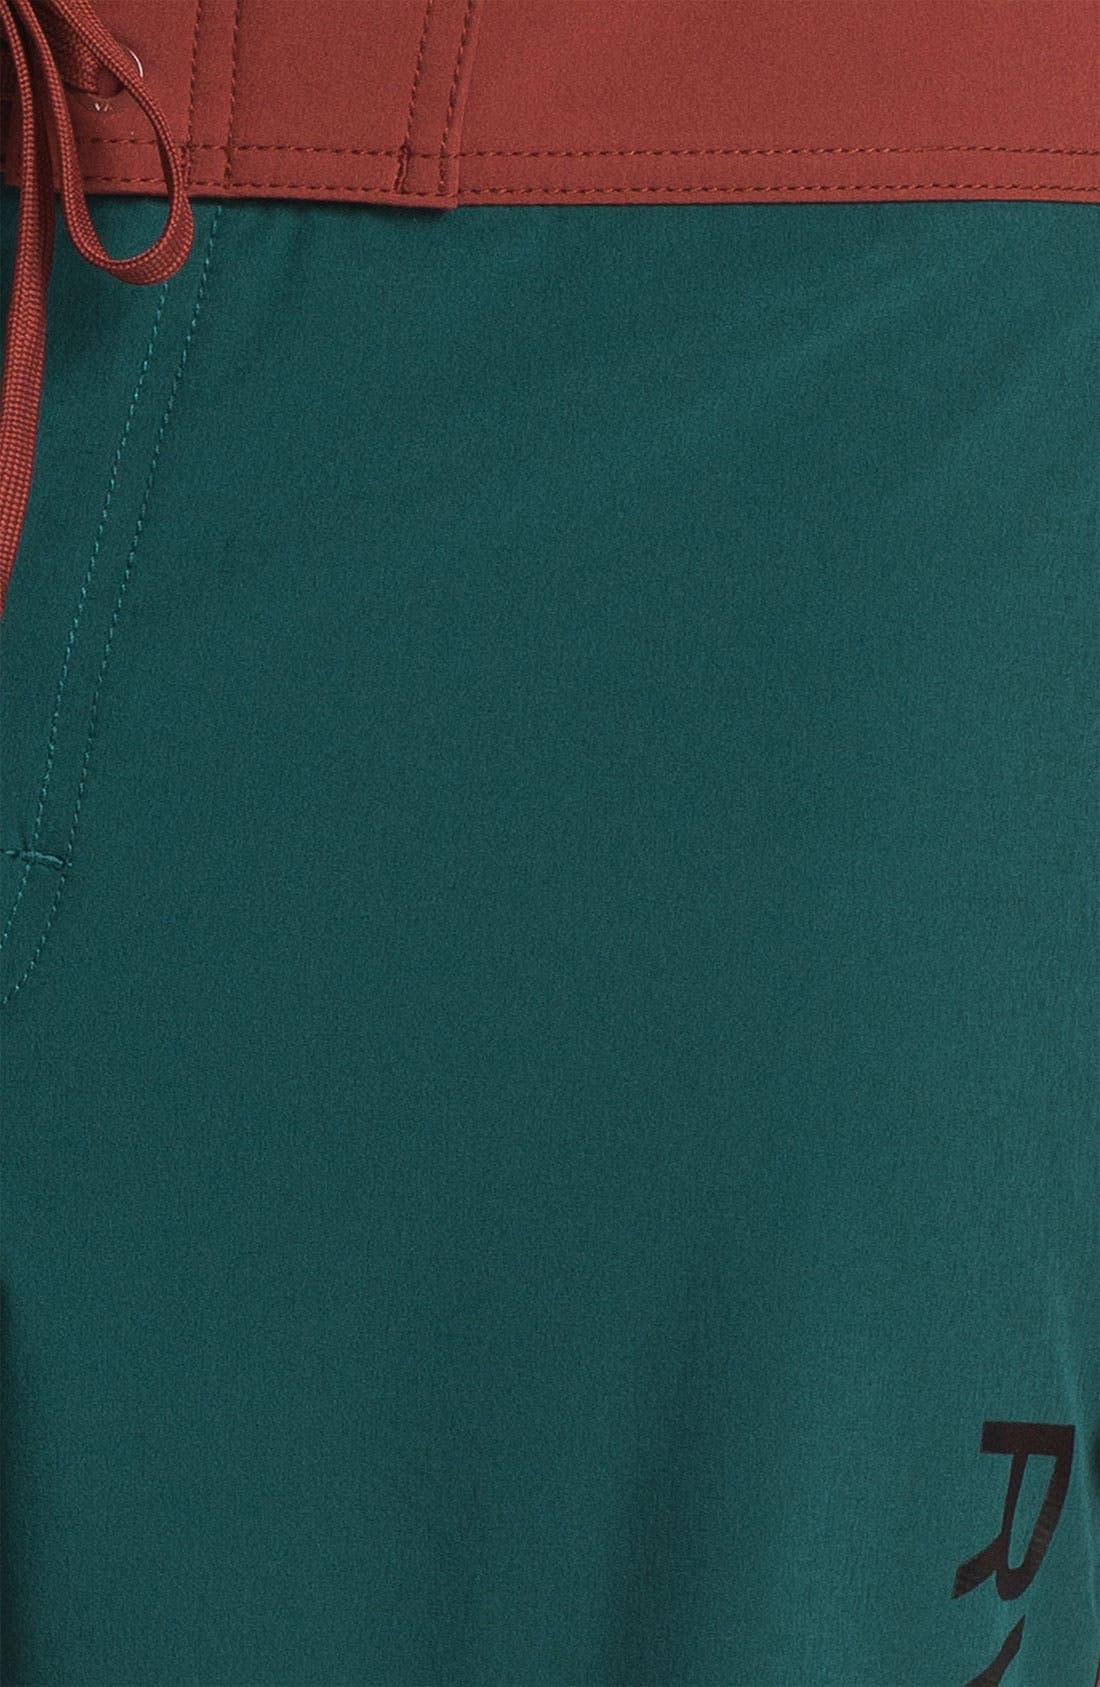 Alternate Image 3  - RVCA 'Eastern' Scalloped Hem Board Shorts